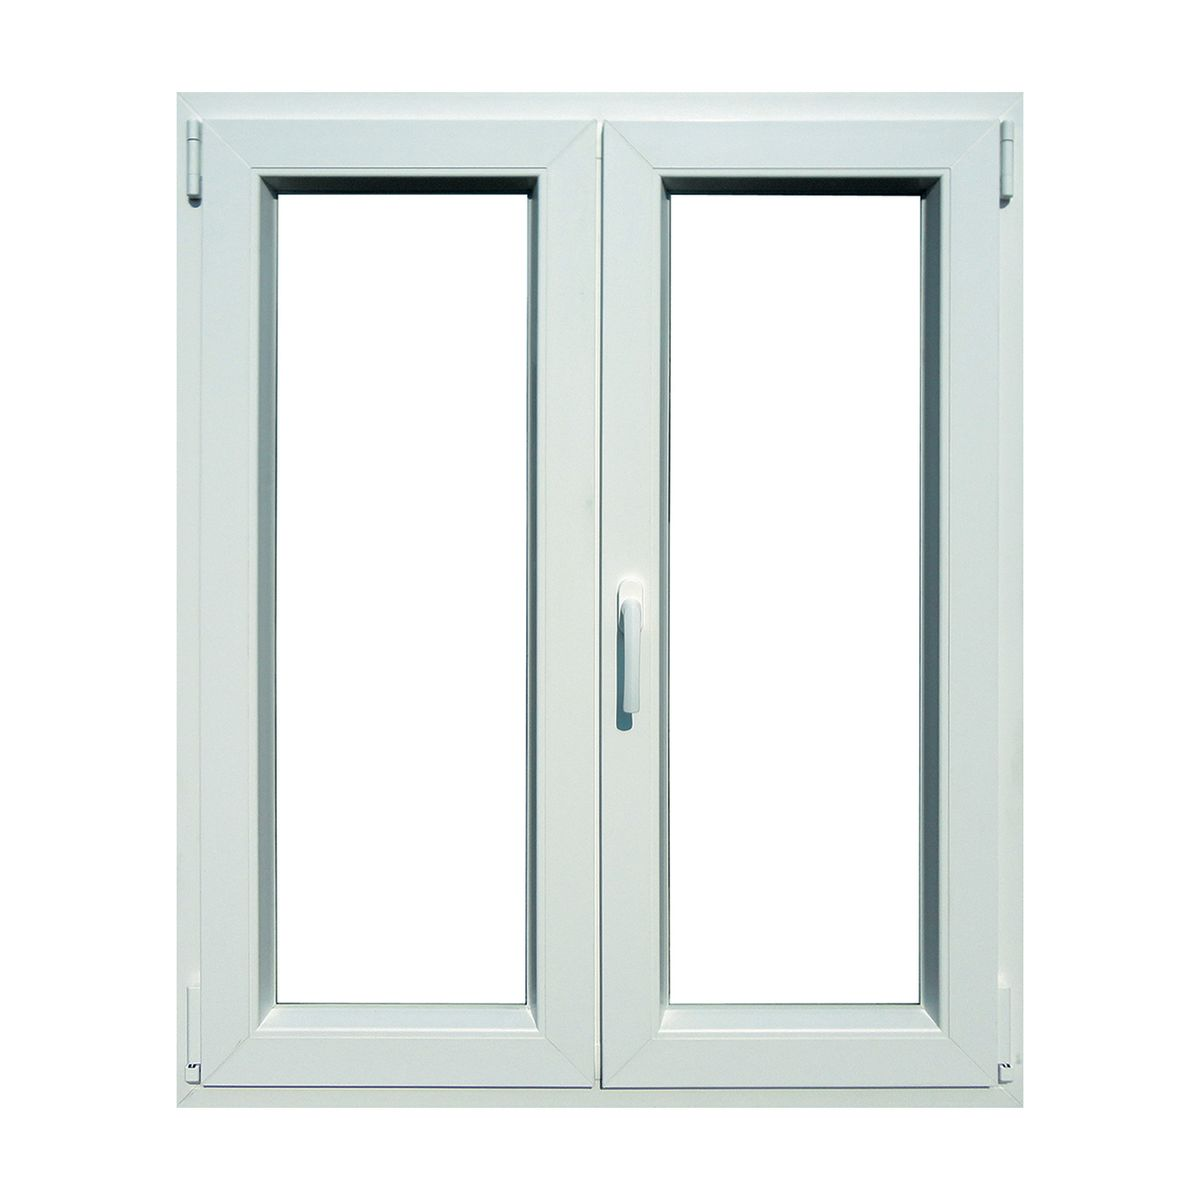 Finestre pvc misure standard great finestre pvc in offerta with finestre pvc misure standard - Porta finestra misure ...